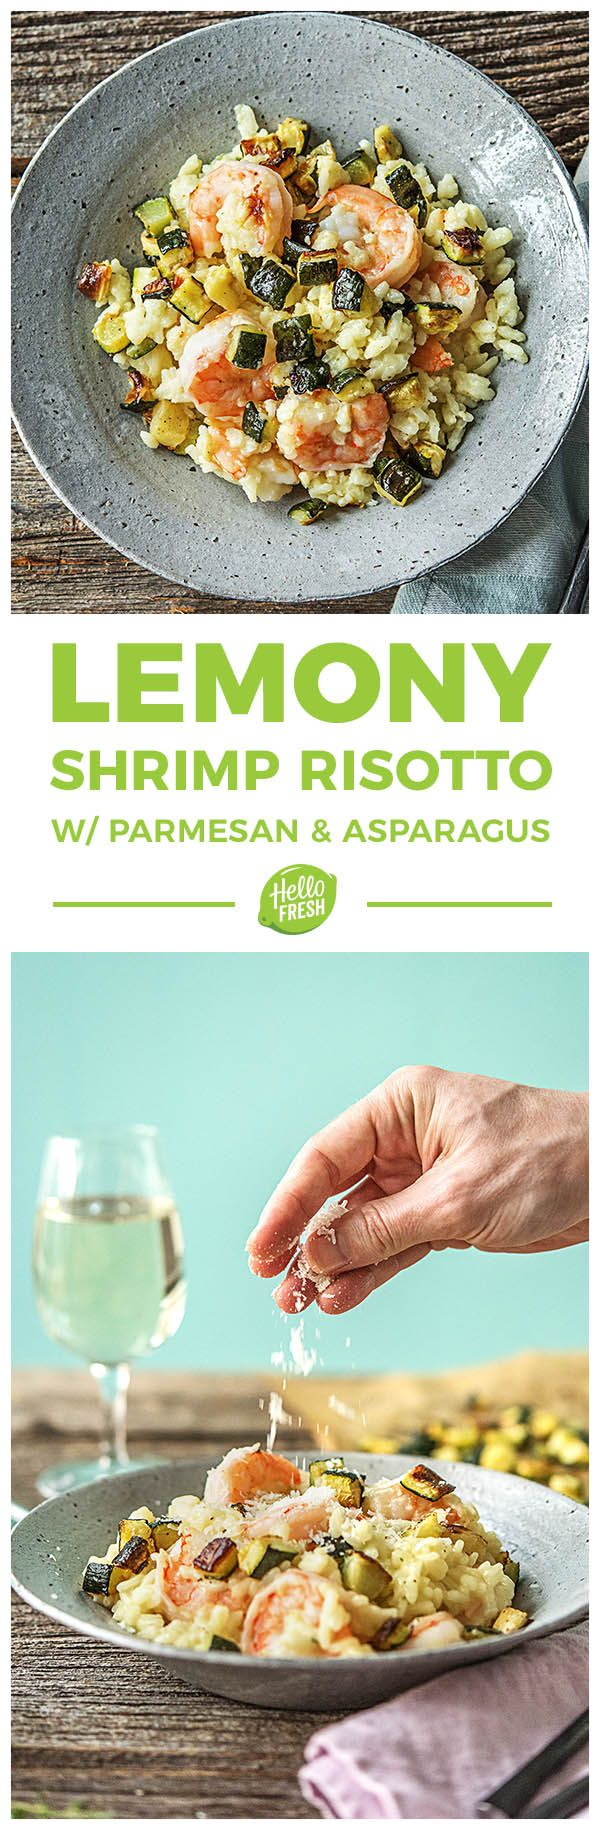 Super simple lemony shrimp risotto recipe | More fancy and wholesome  recipes on hellofresh.com